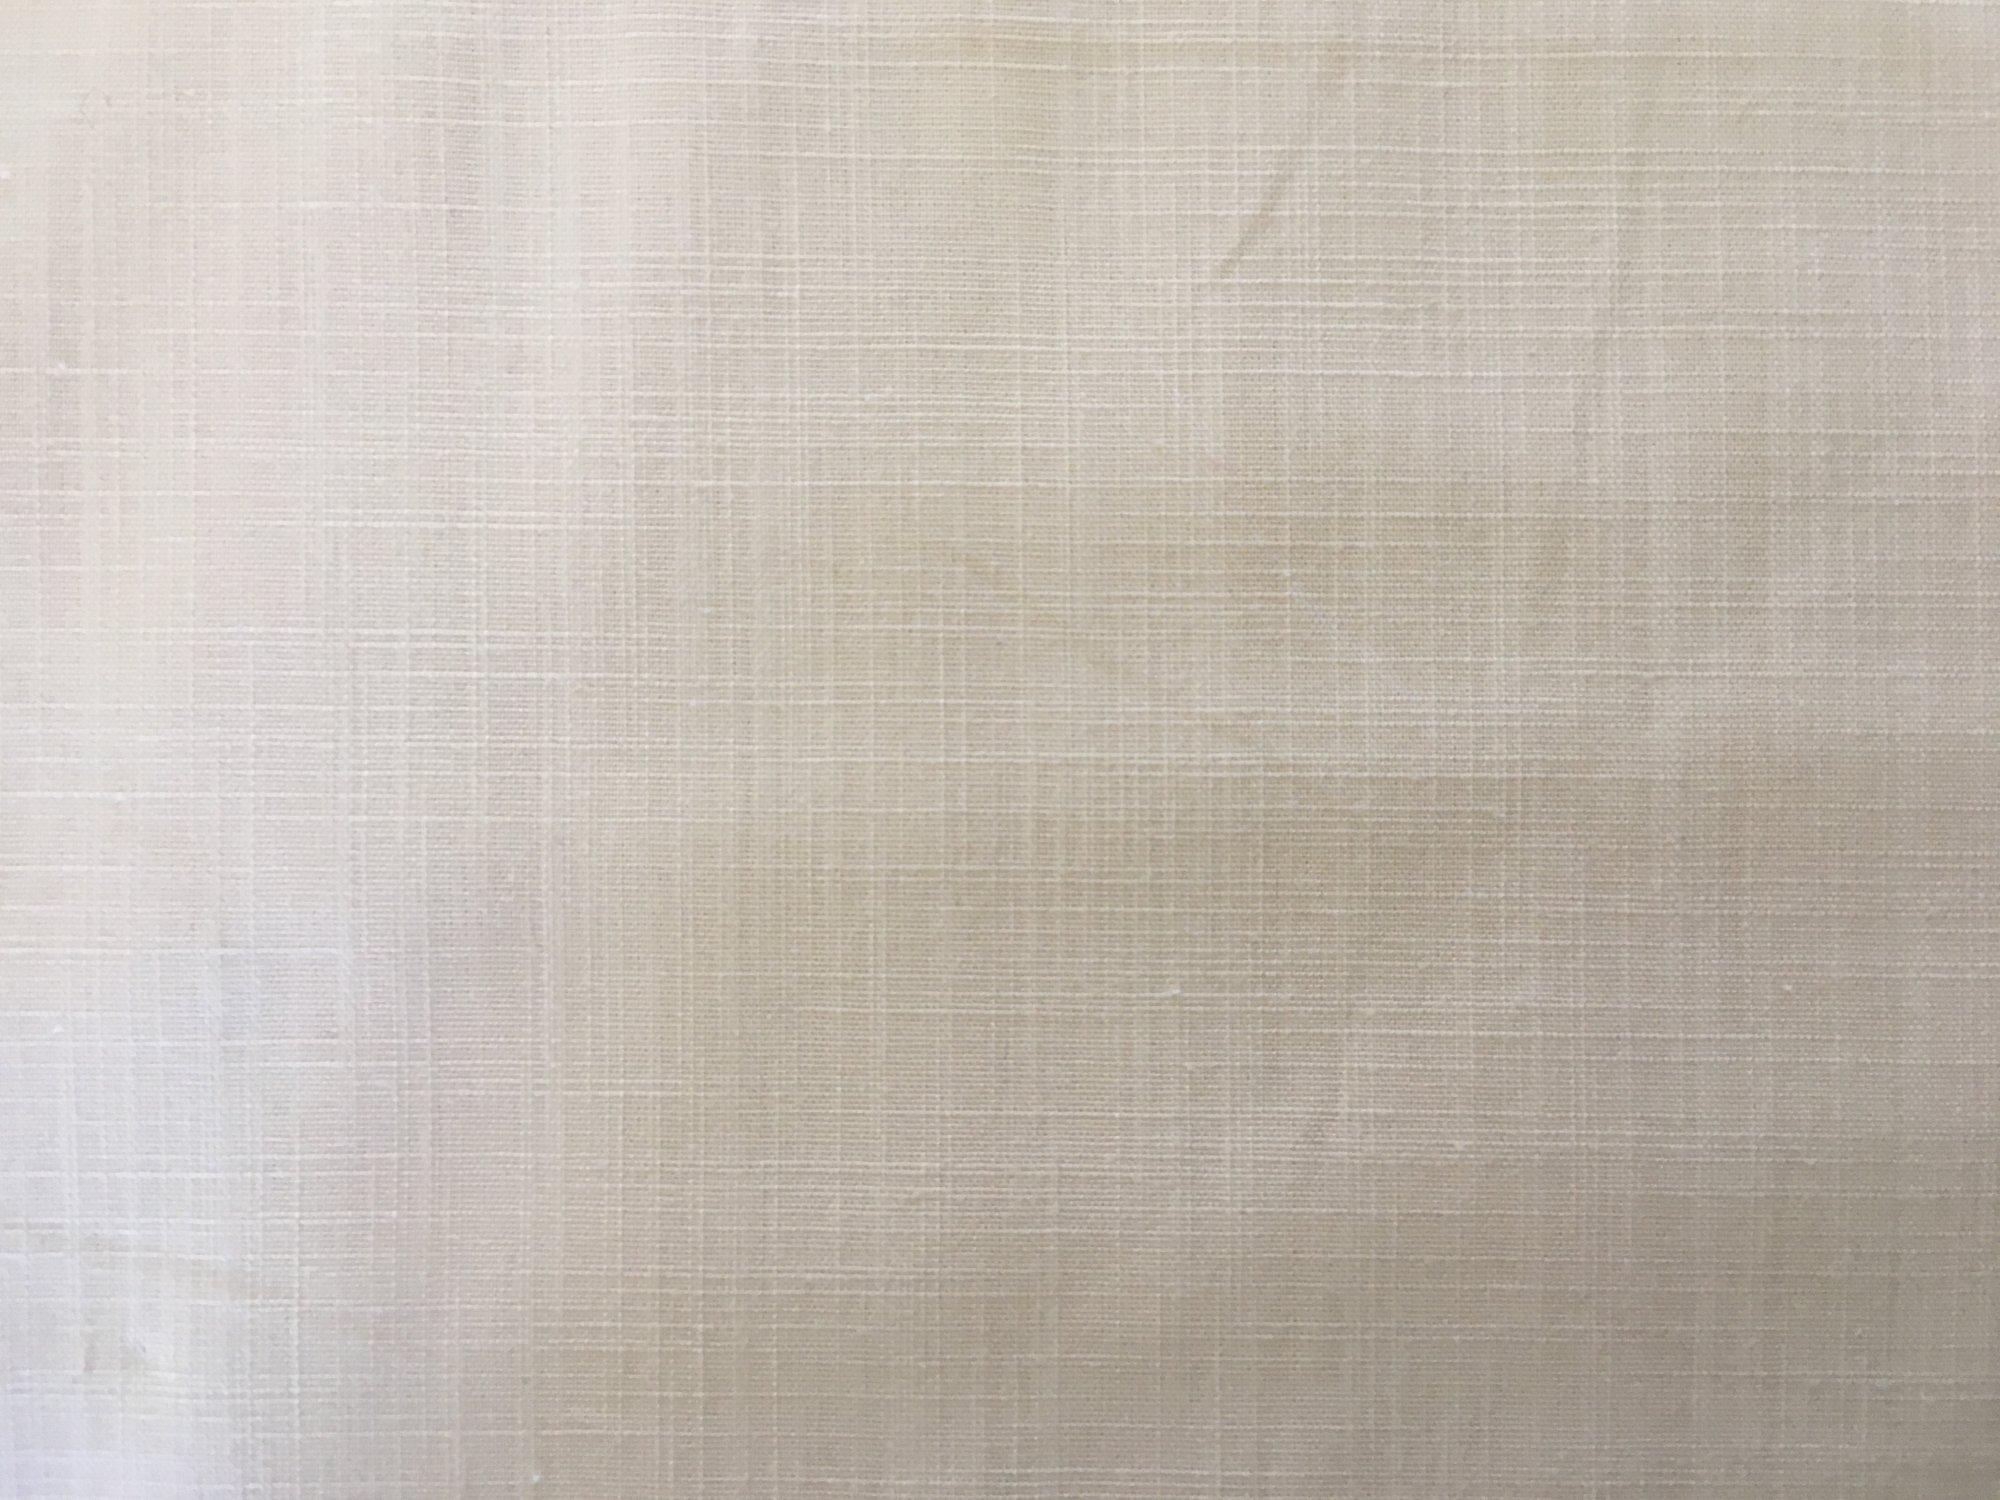 Linen-Look Textured Cotton Cream by P&B Textiles